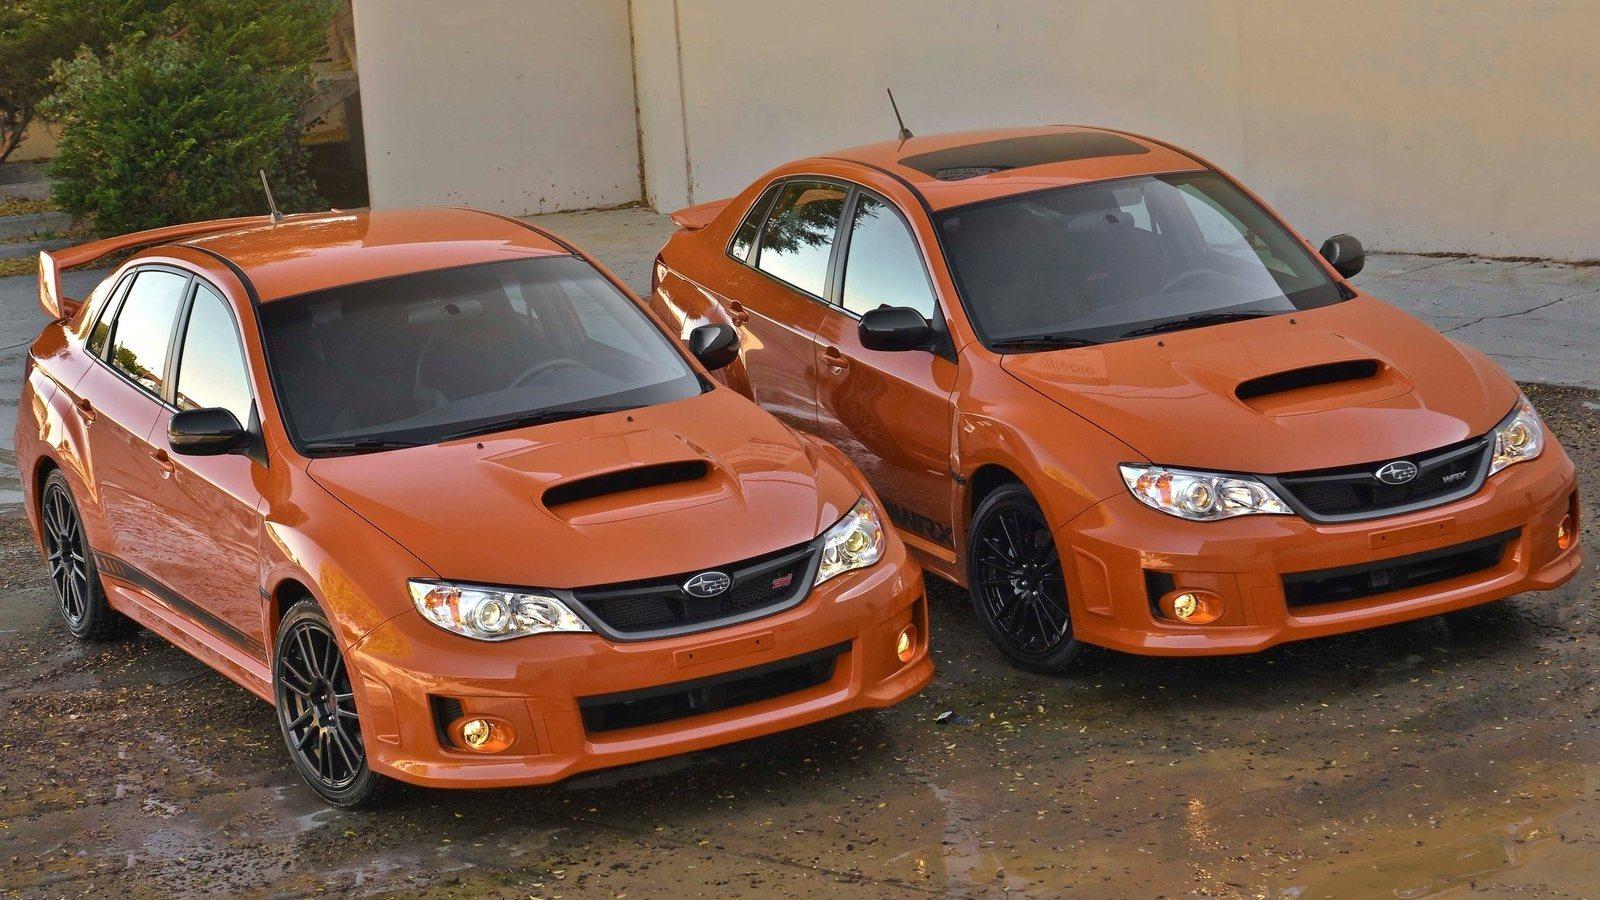 Subaru impreza wrx and wrx sti special edition